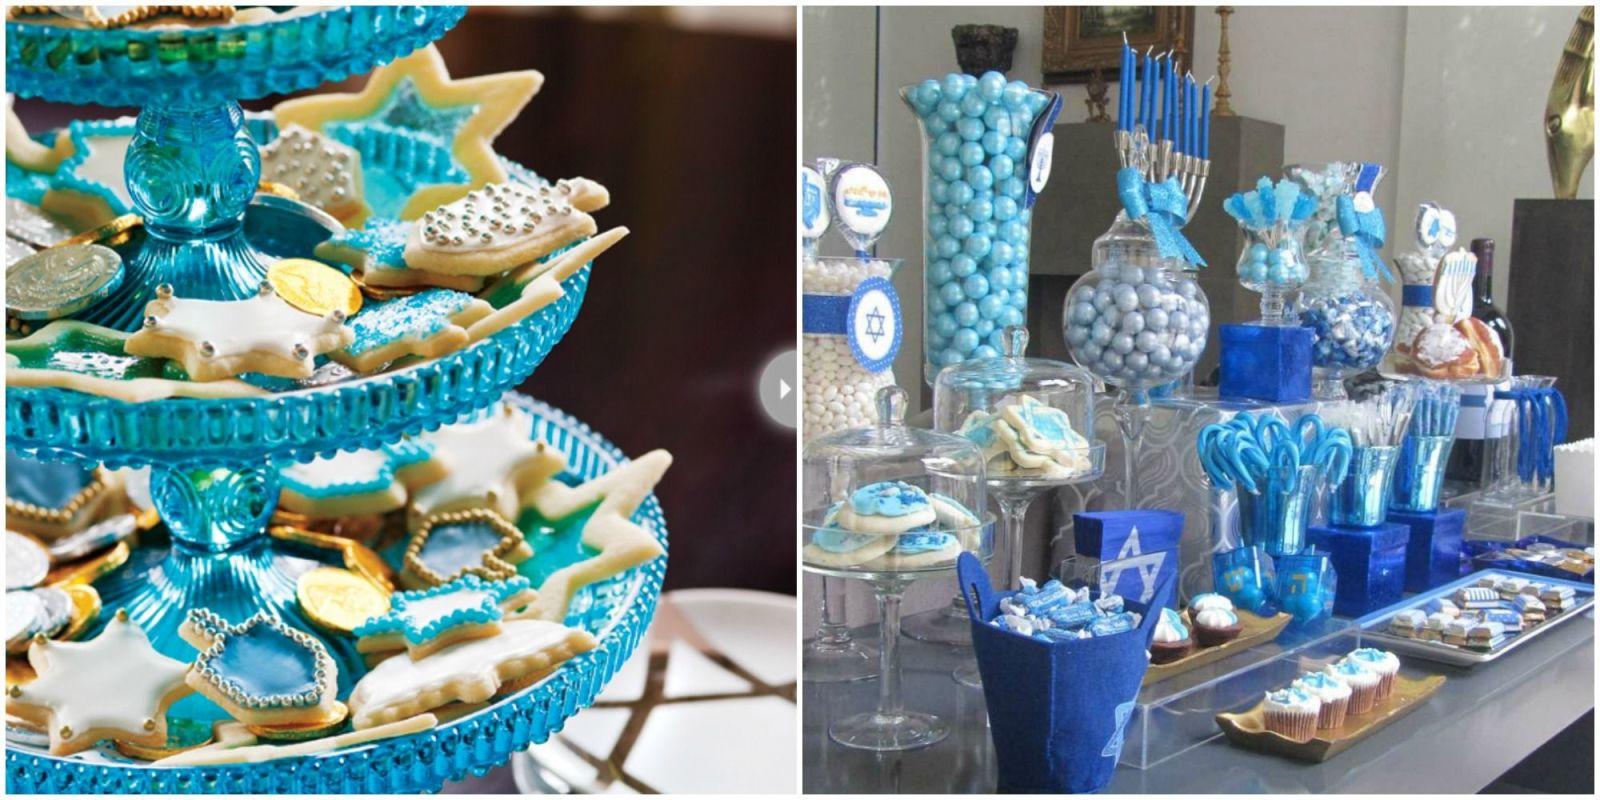 9 stunning hanukkah decorations - Hanukkah Decorations